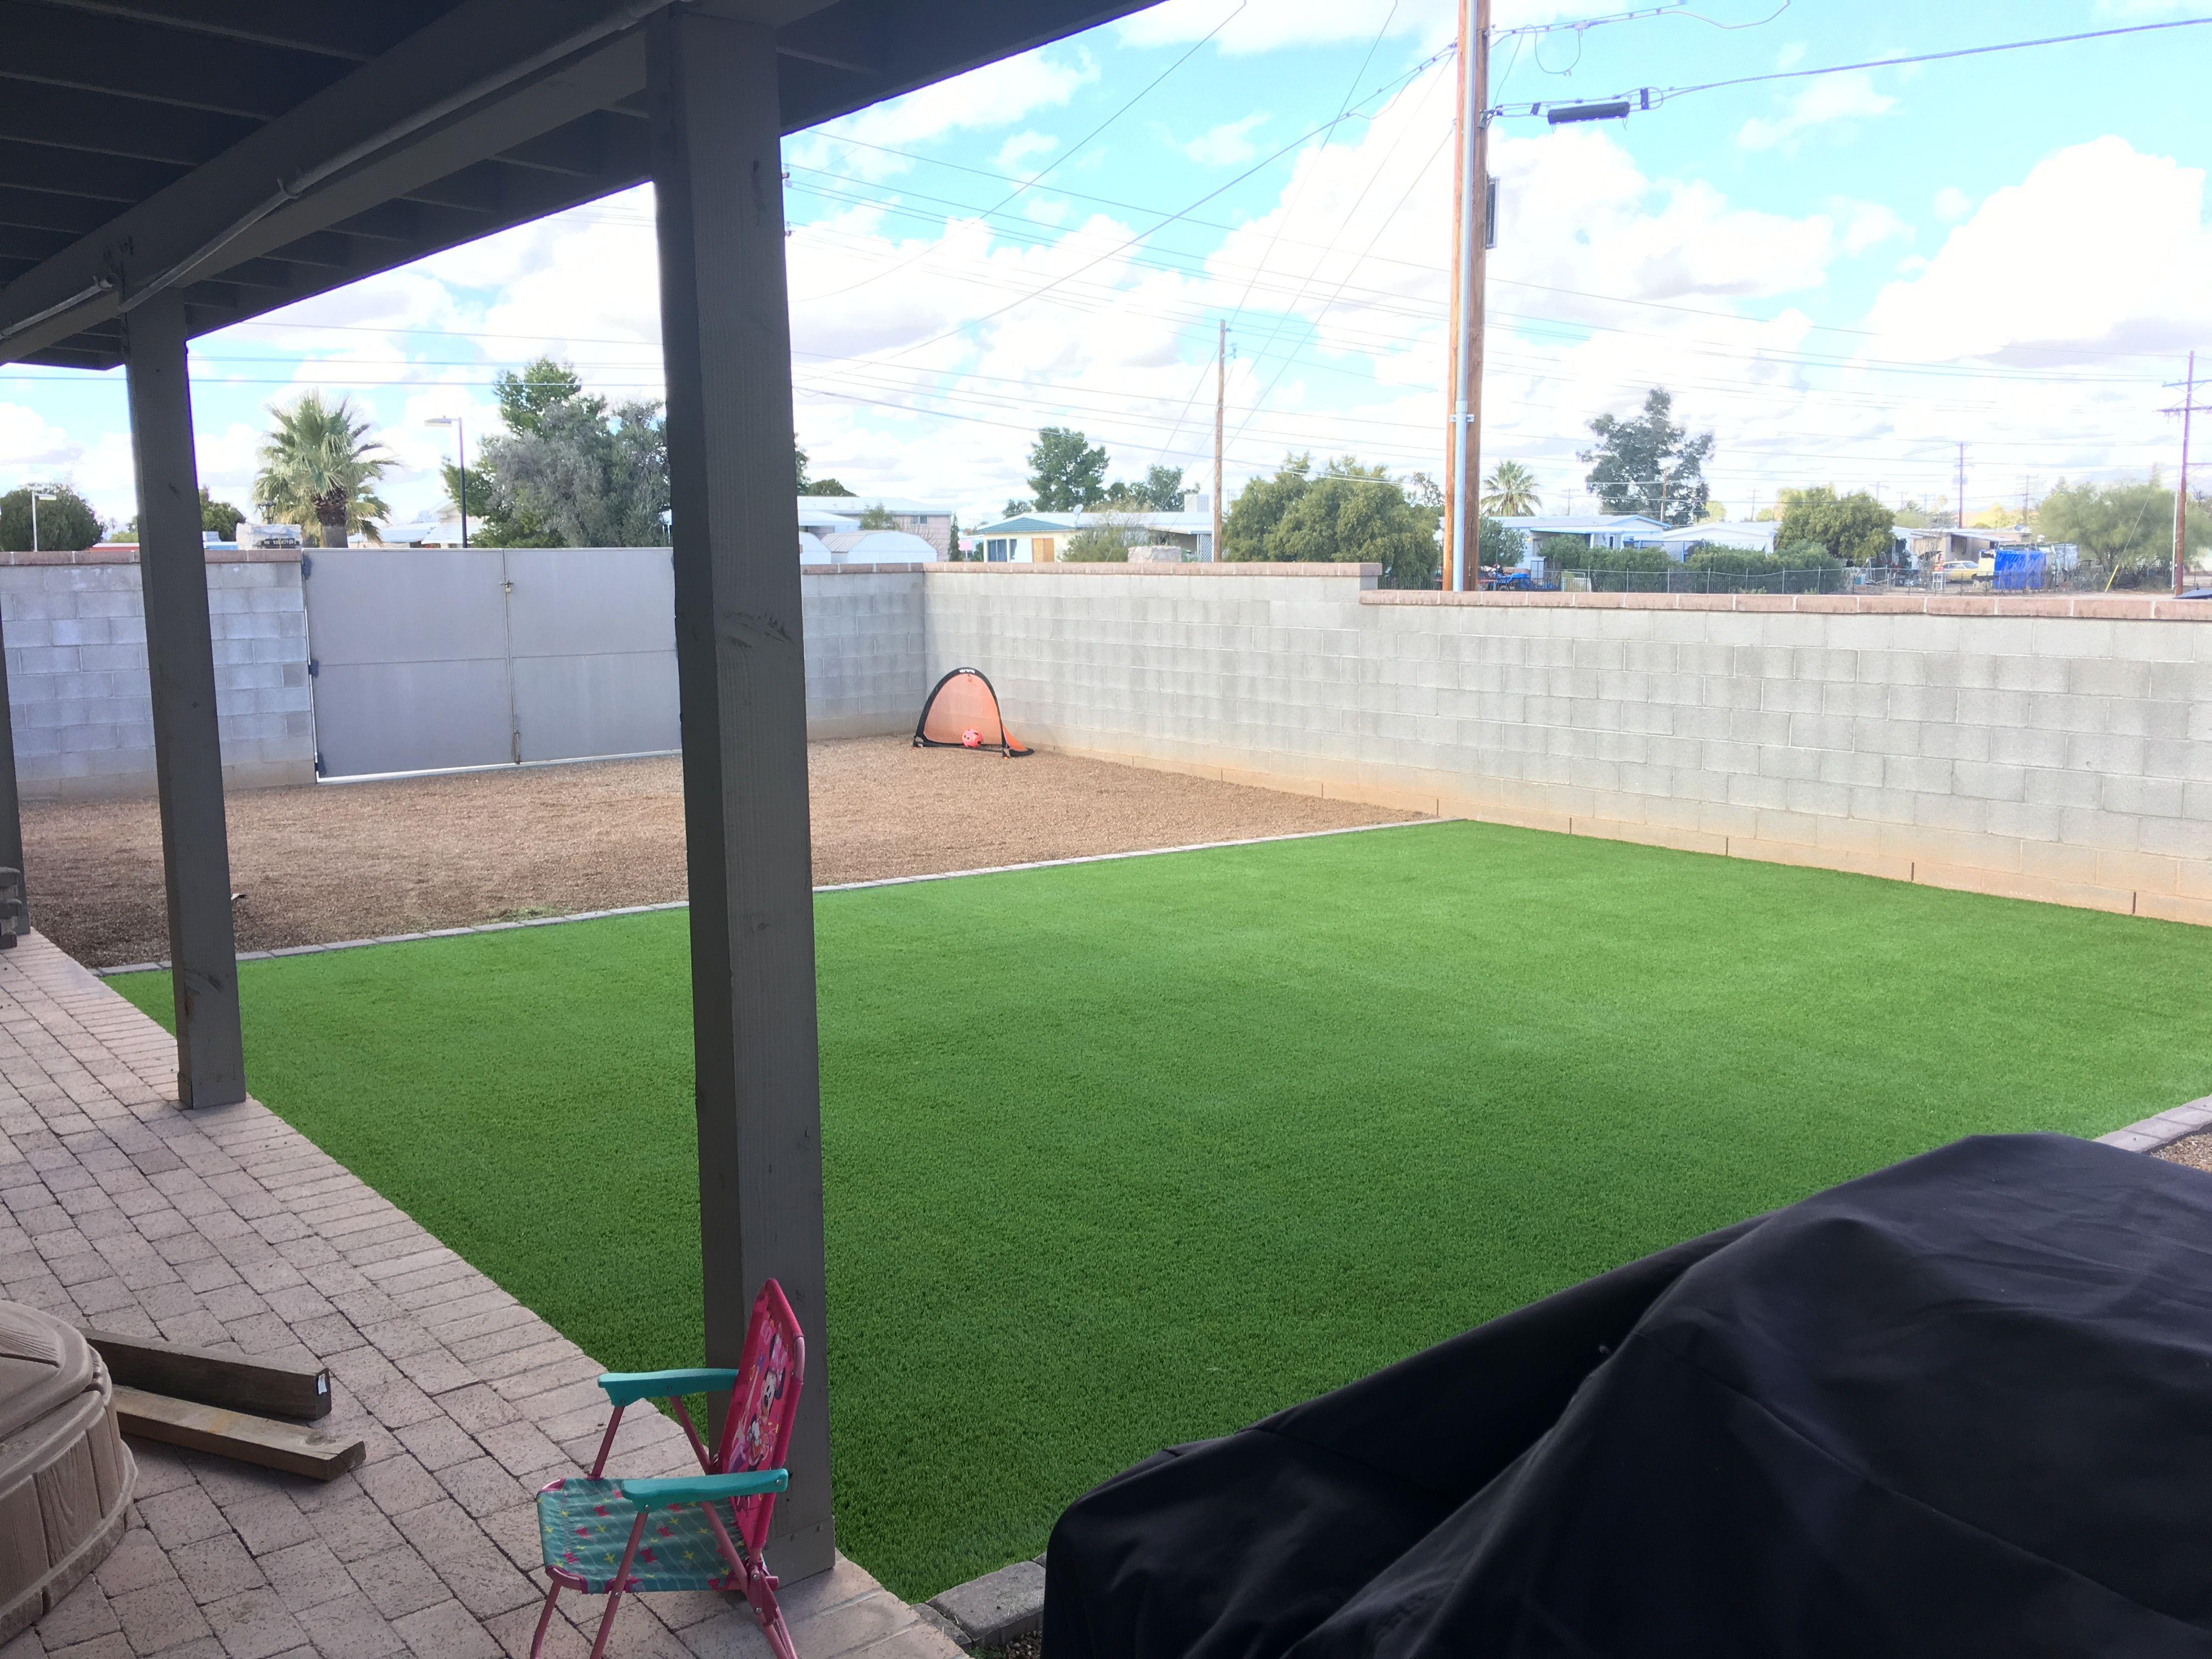 Pin by Cassandra Jensen on Backyard | Baseball field ...